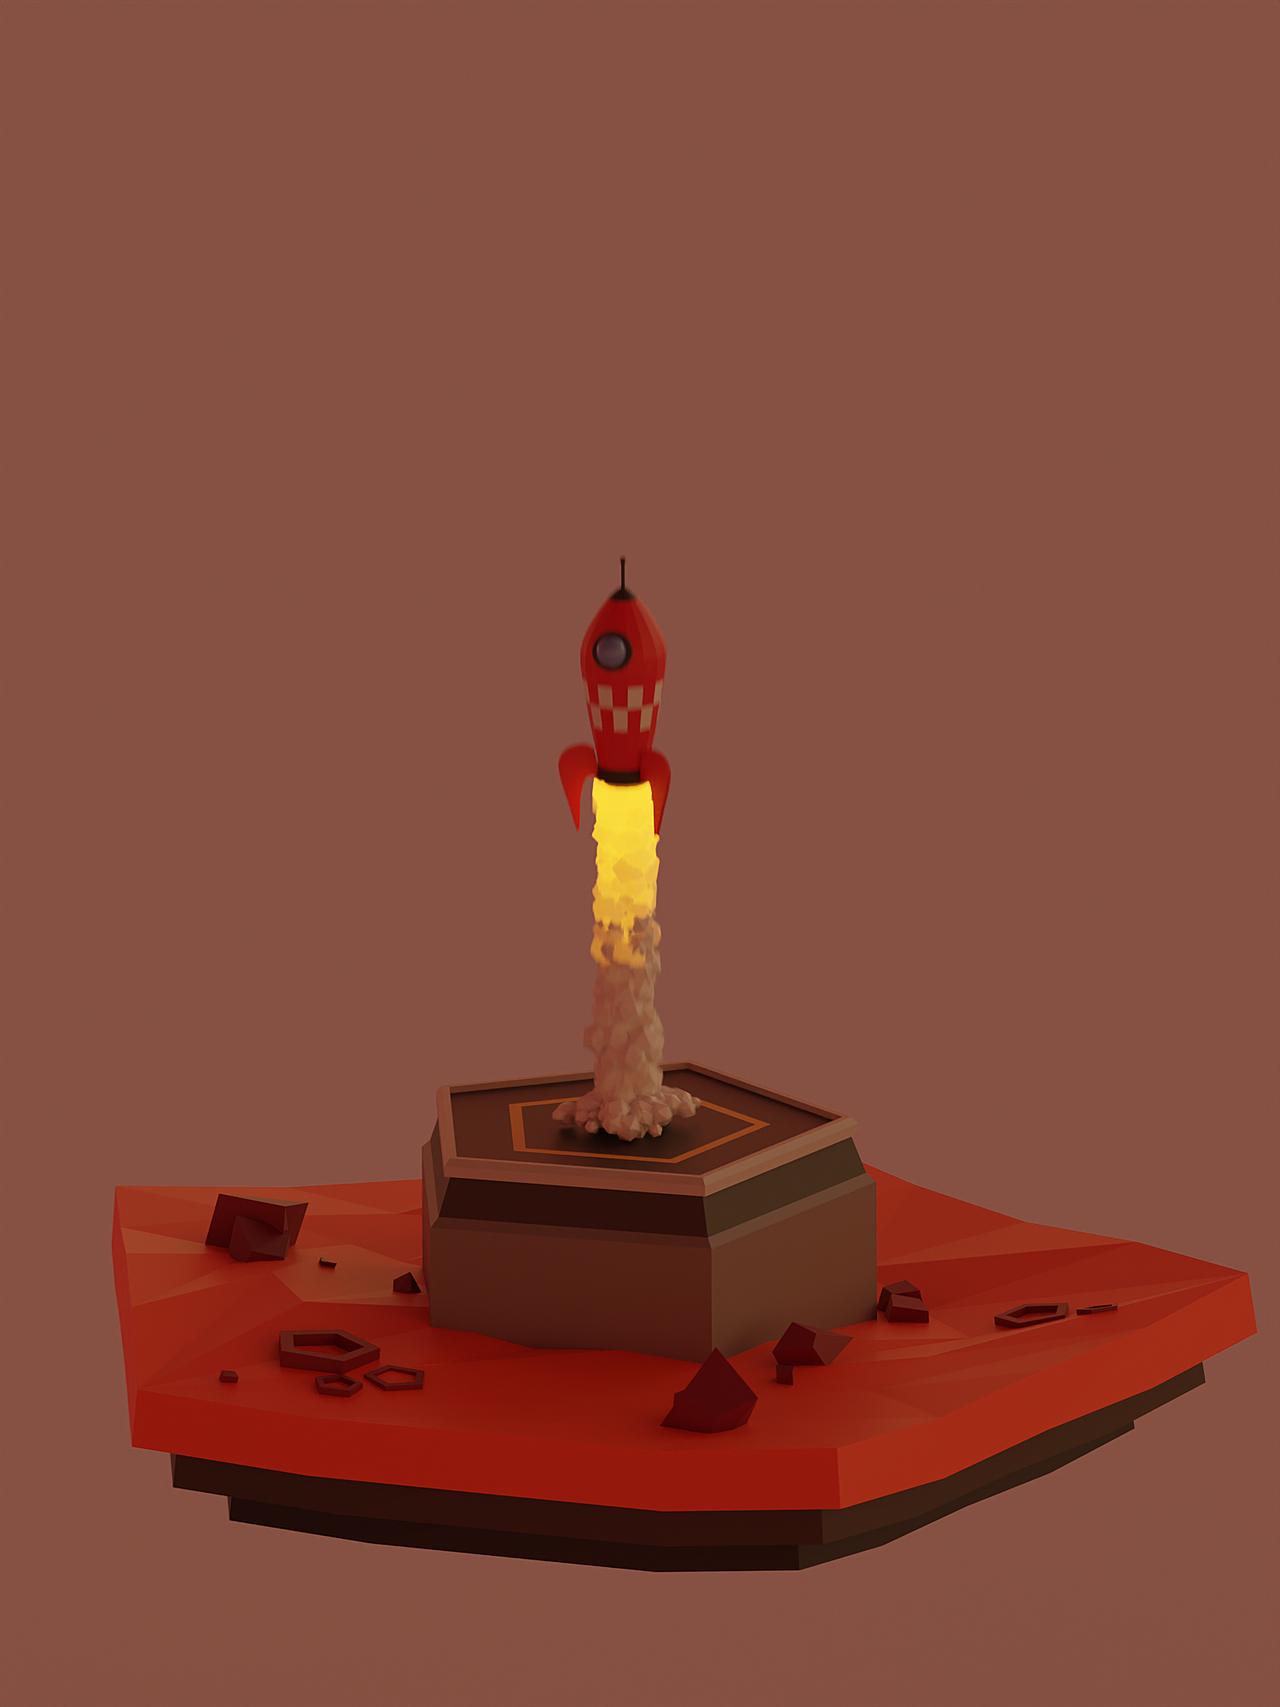 Low Poly Rocket